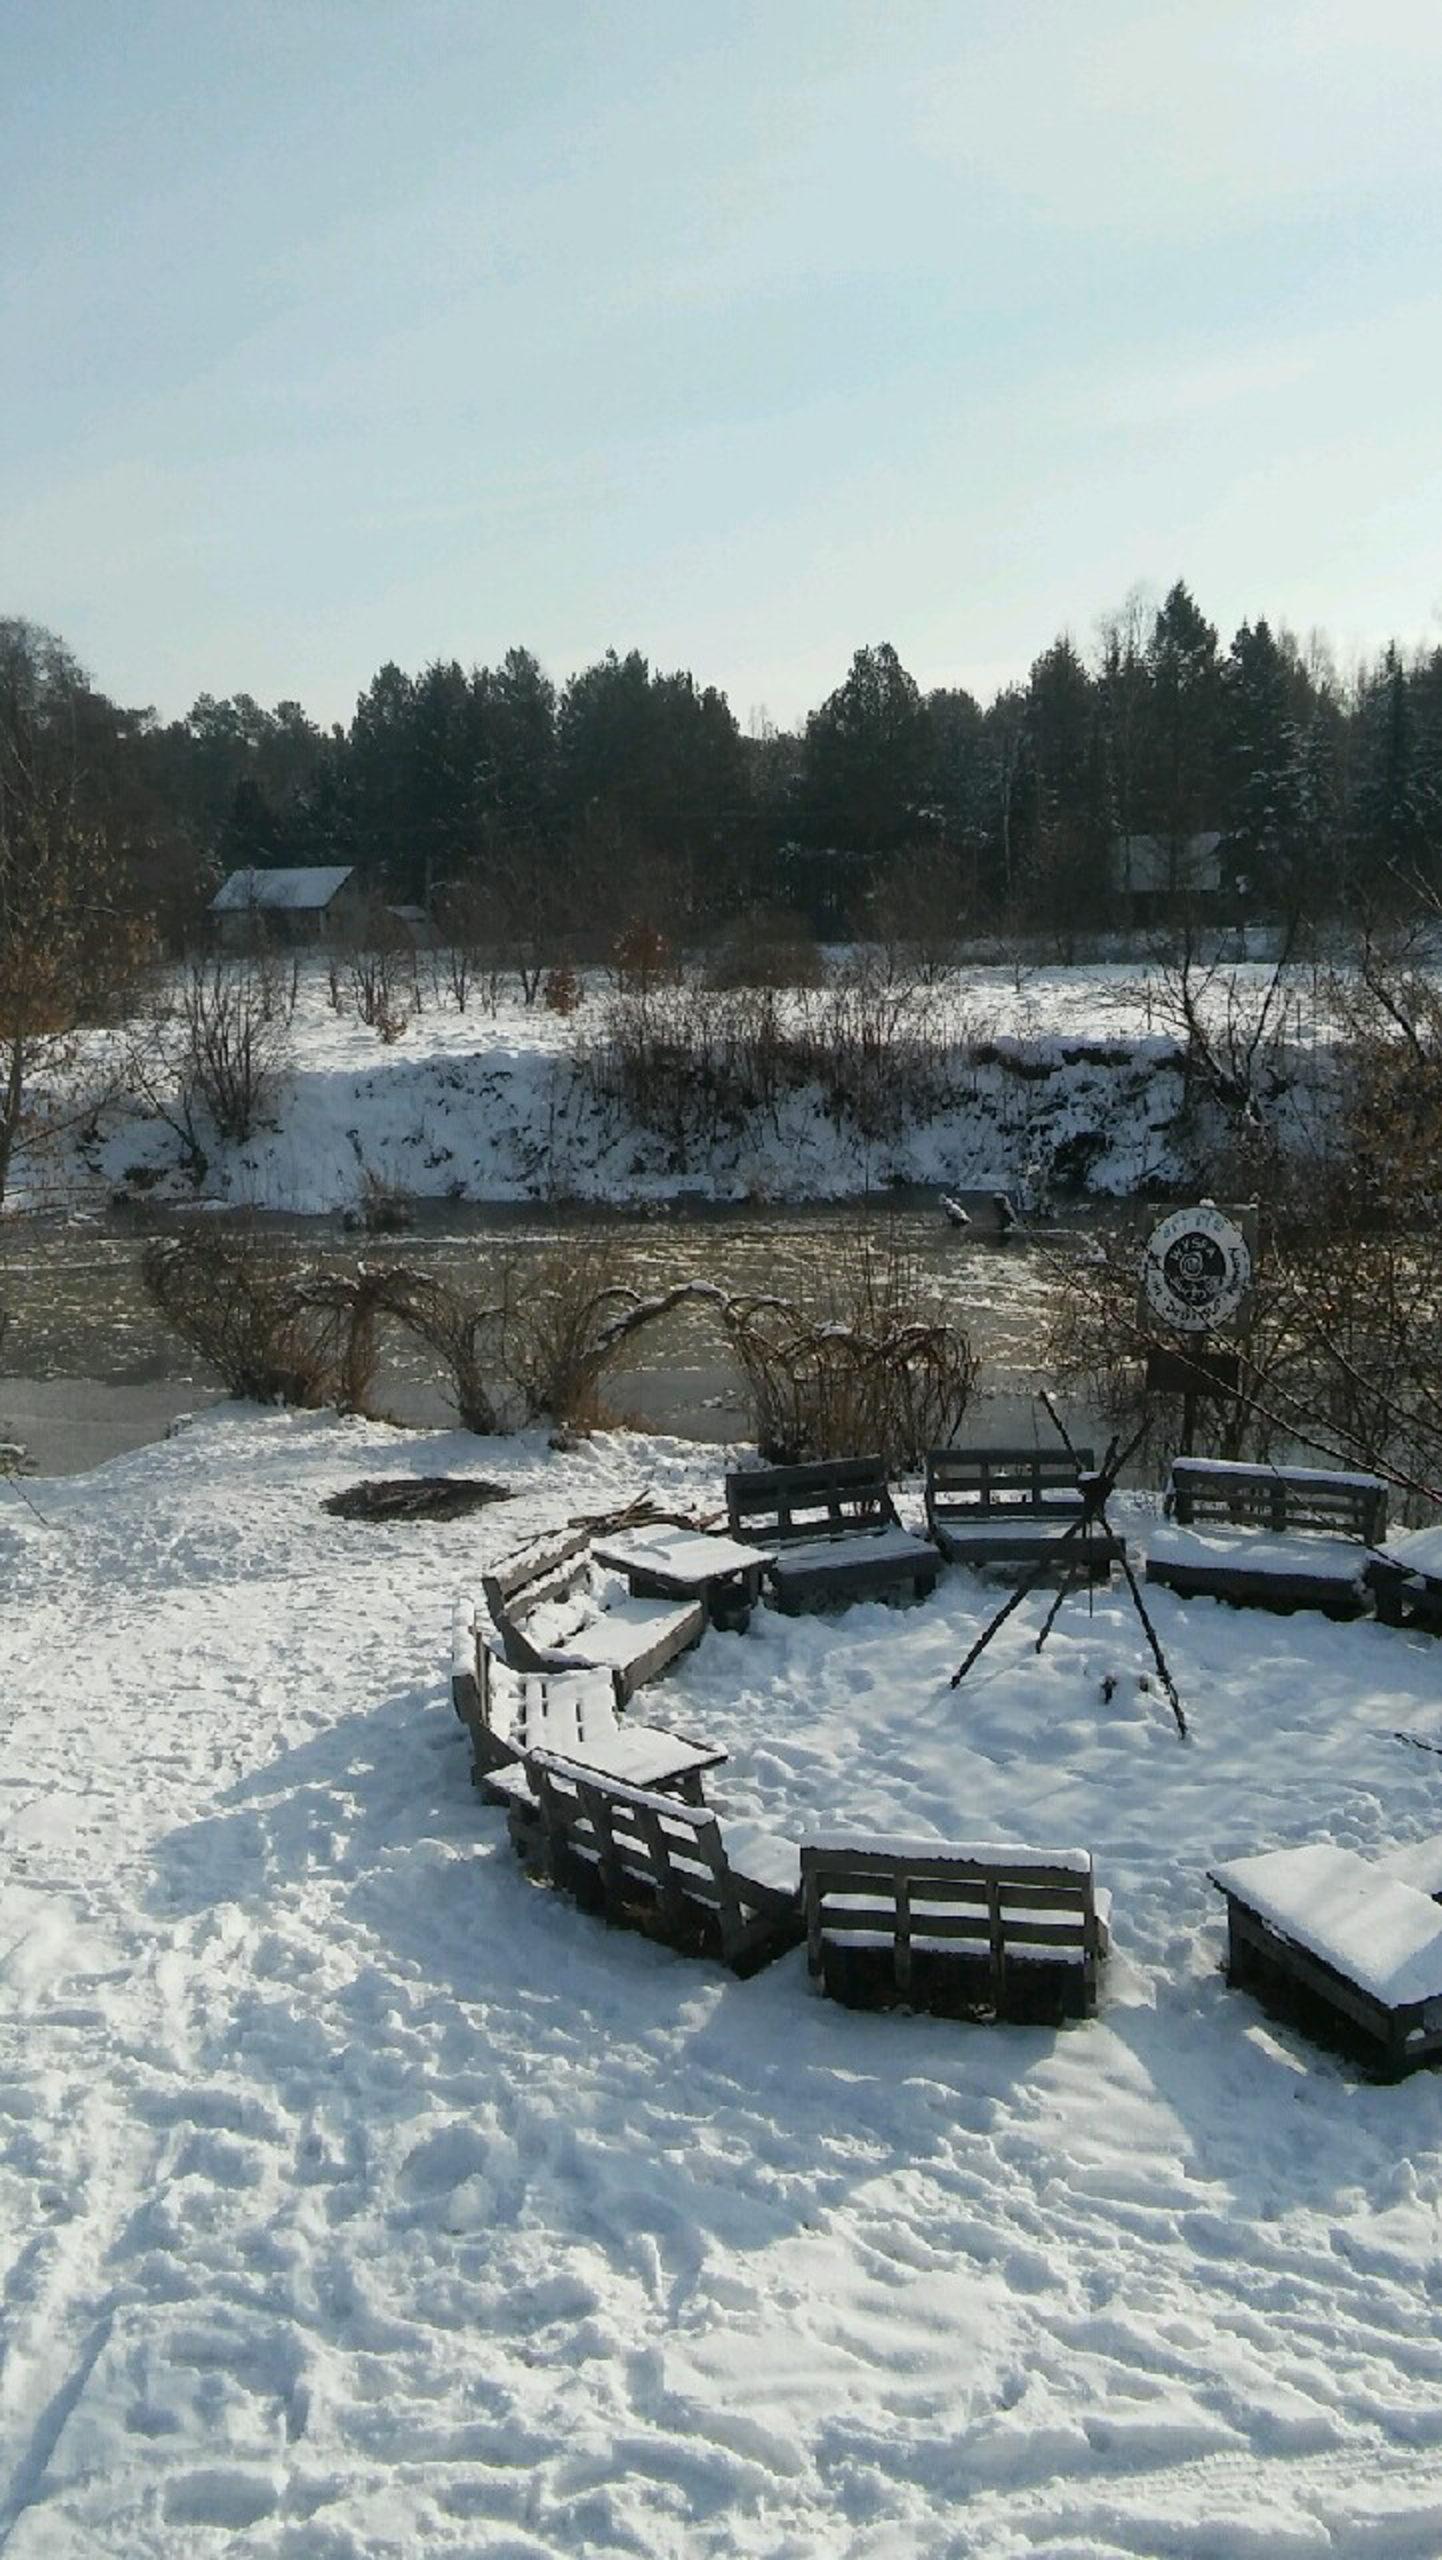 widok na palenisko i rzekę, zima